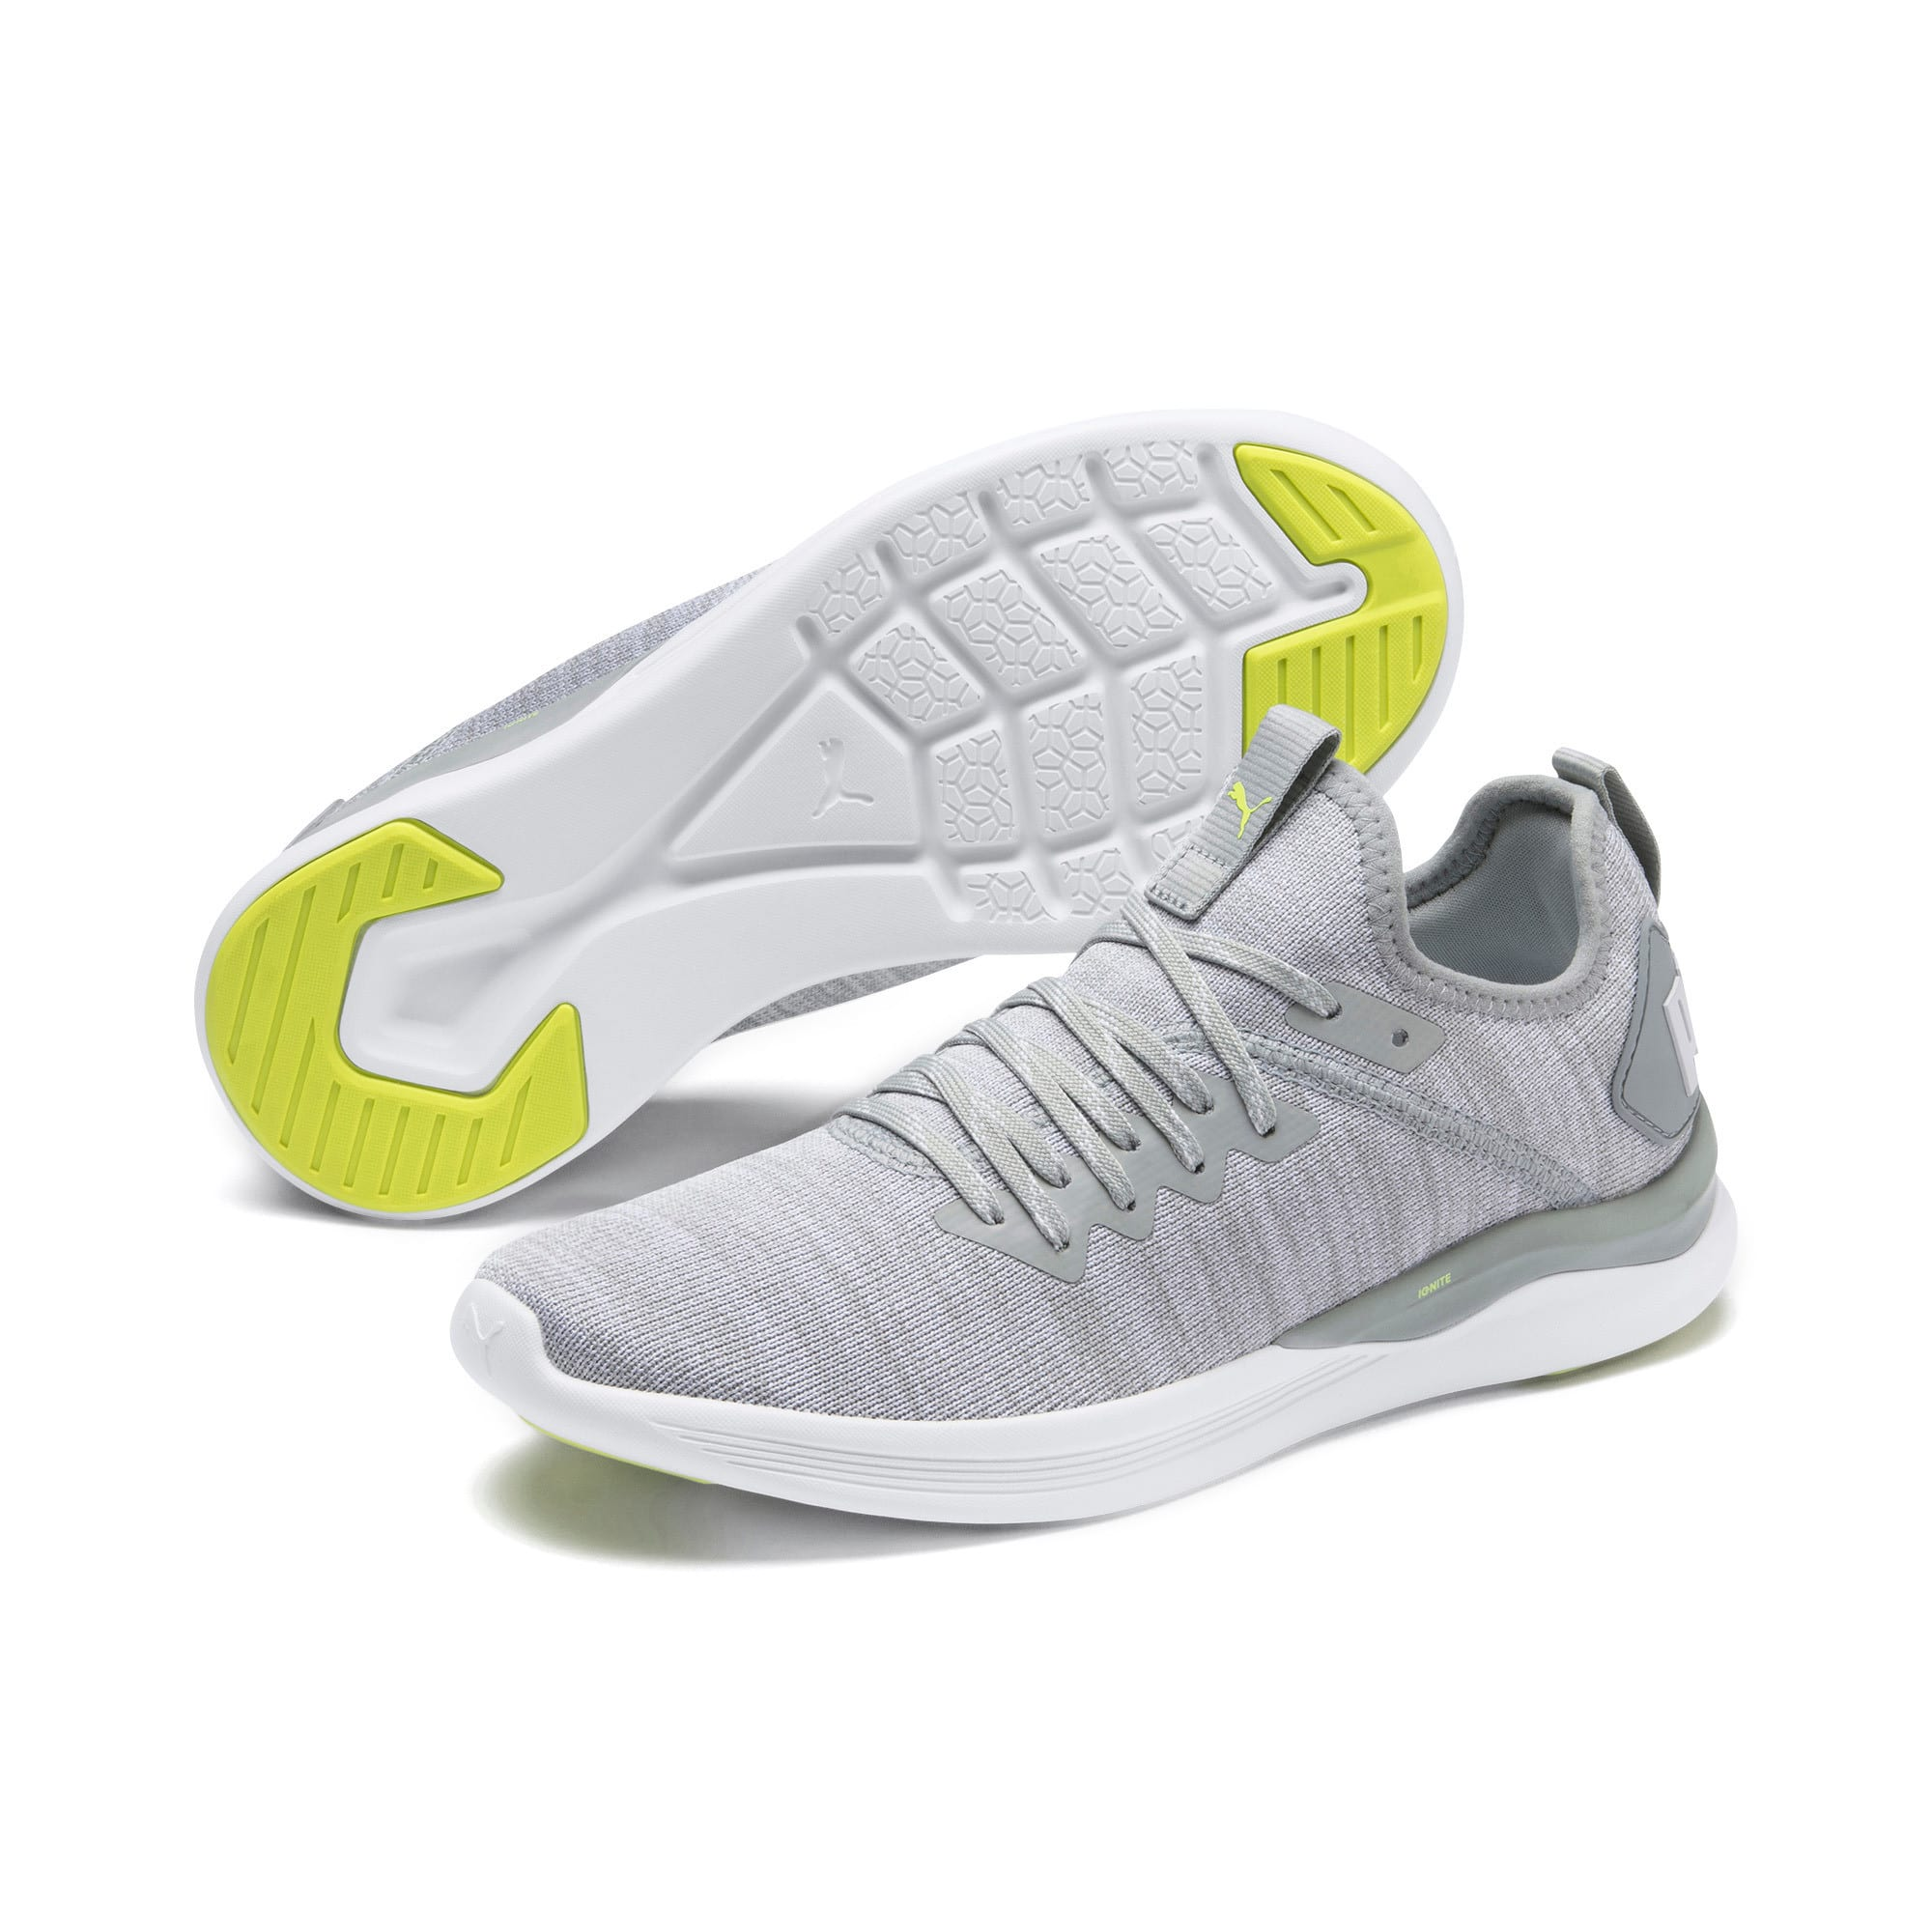 Thumbnail 3 of IGNITE Flash evoKNIT Women's Running Shoes, Quarry-White-Milky Blue, medium